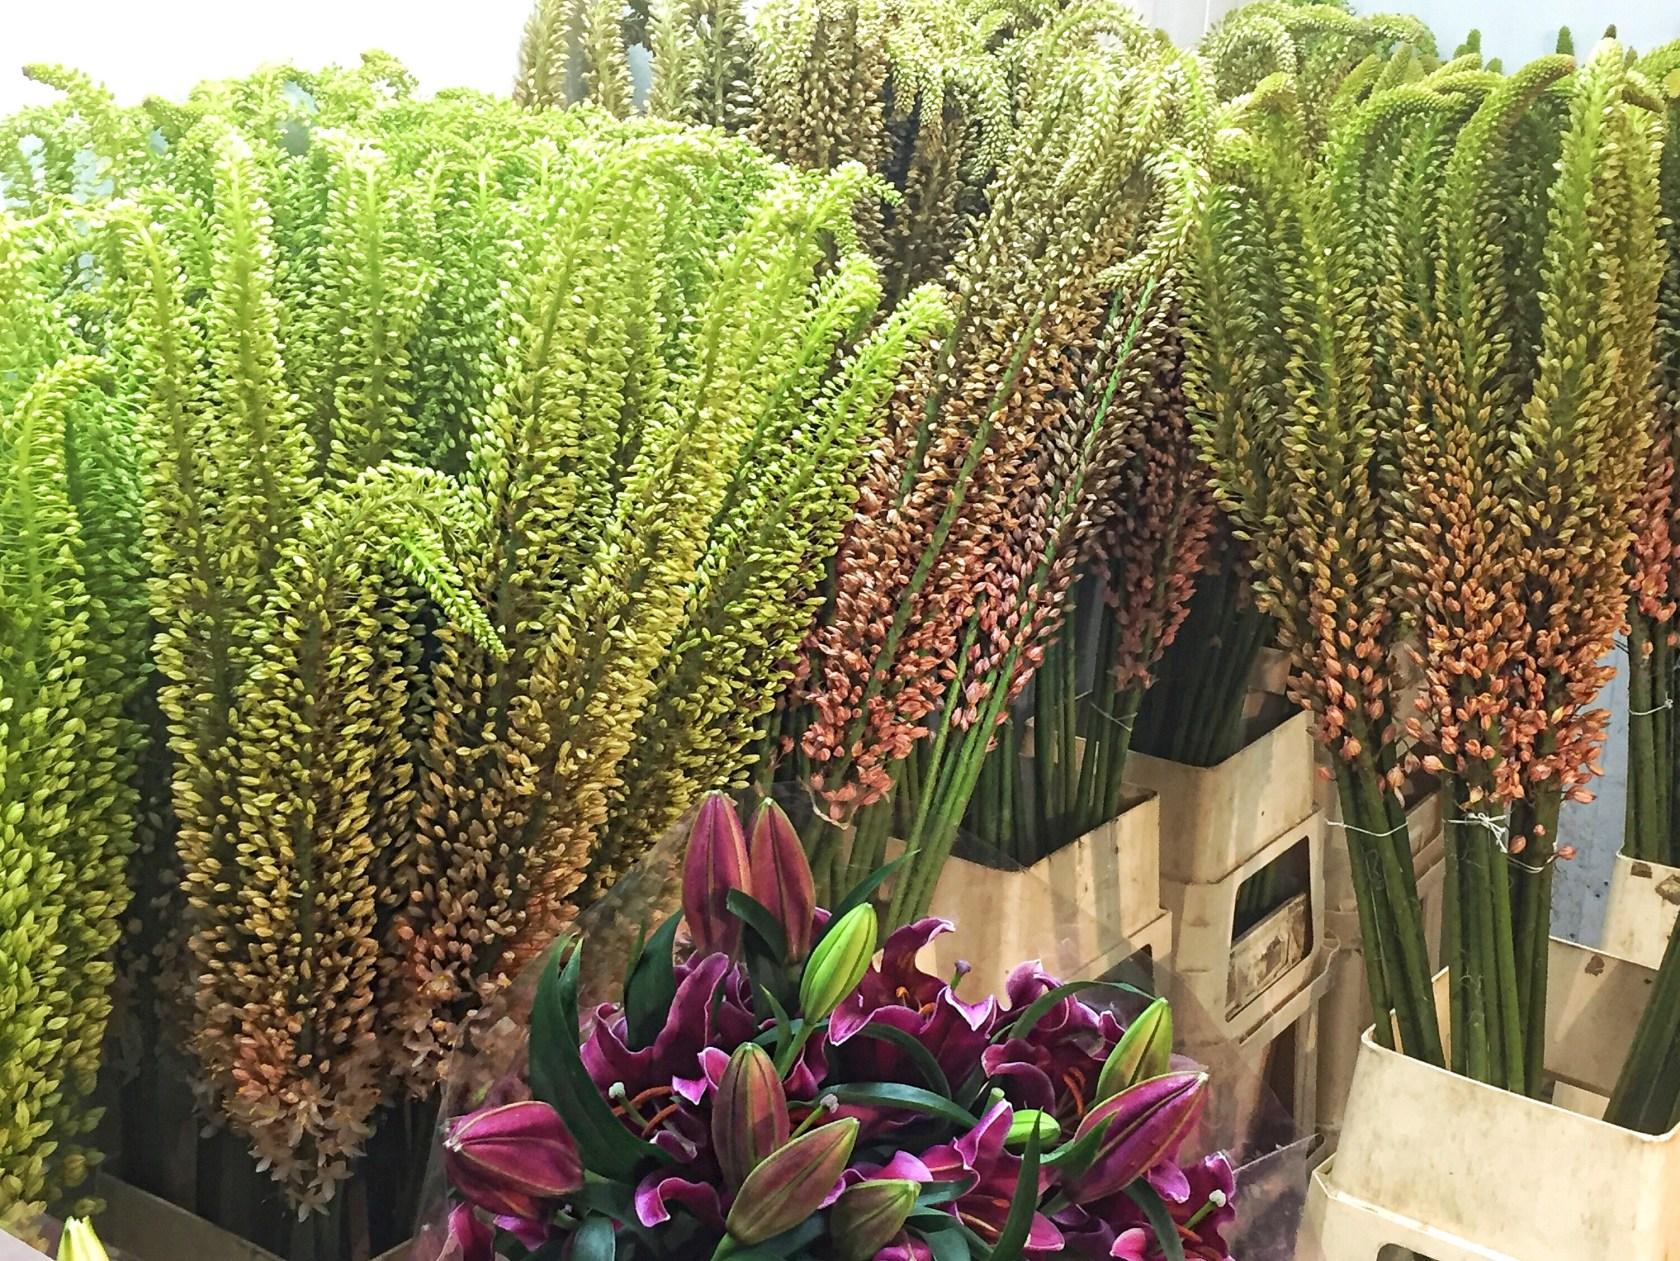 Sensory Saturdays: The Flower Market